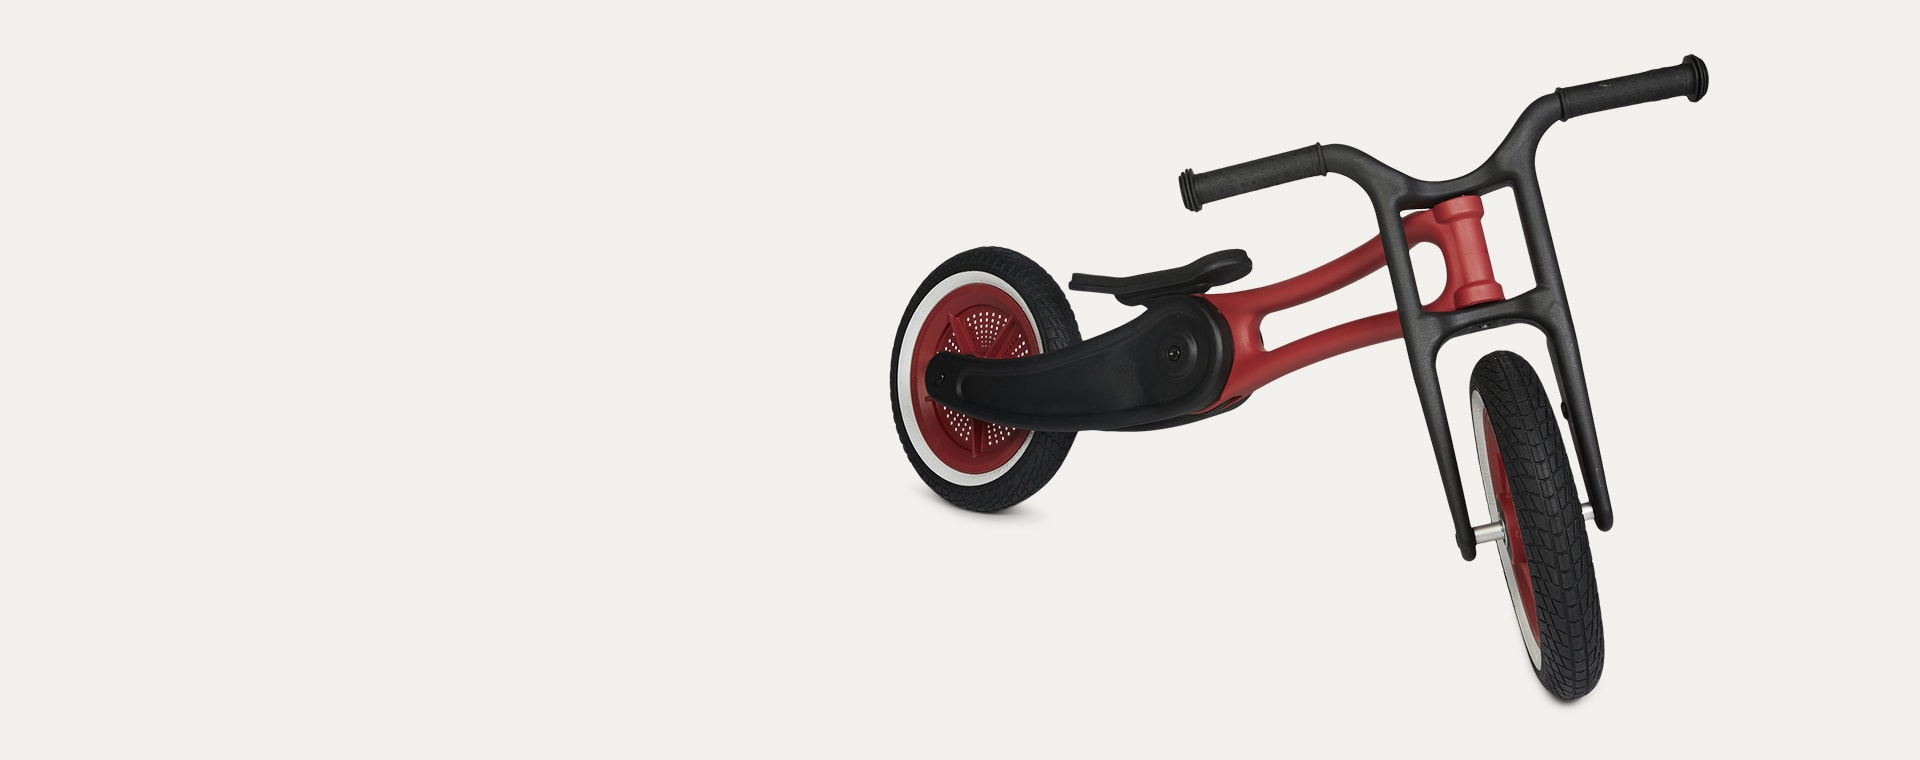 Red Wishbone Design Studio Wishbone Bike 2 in 1